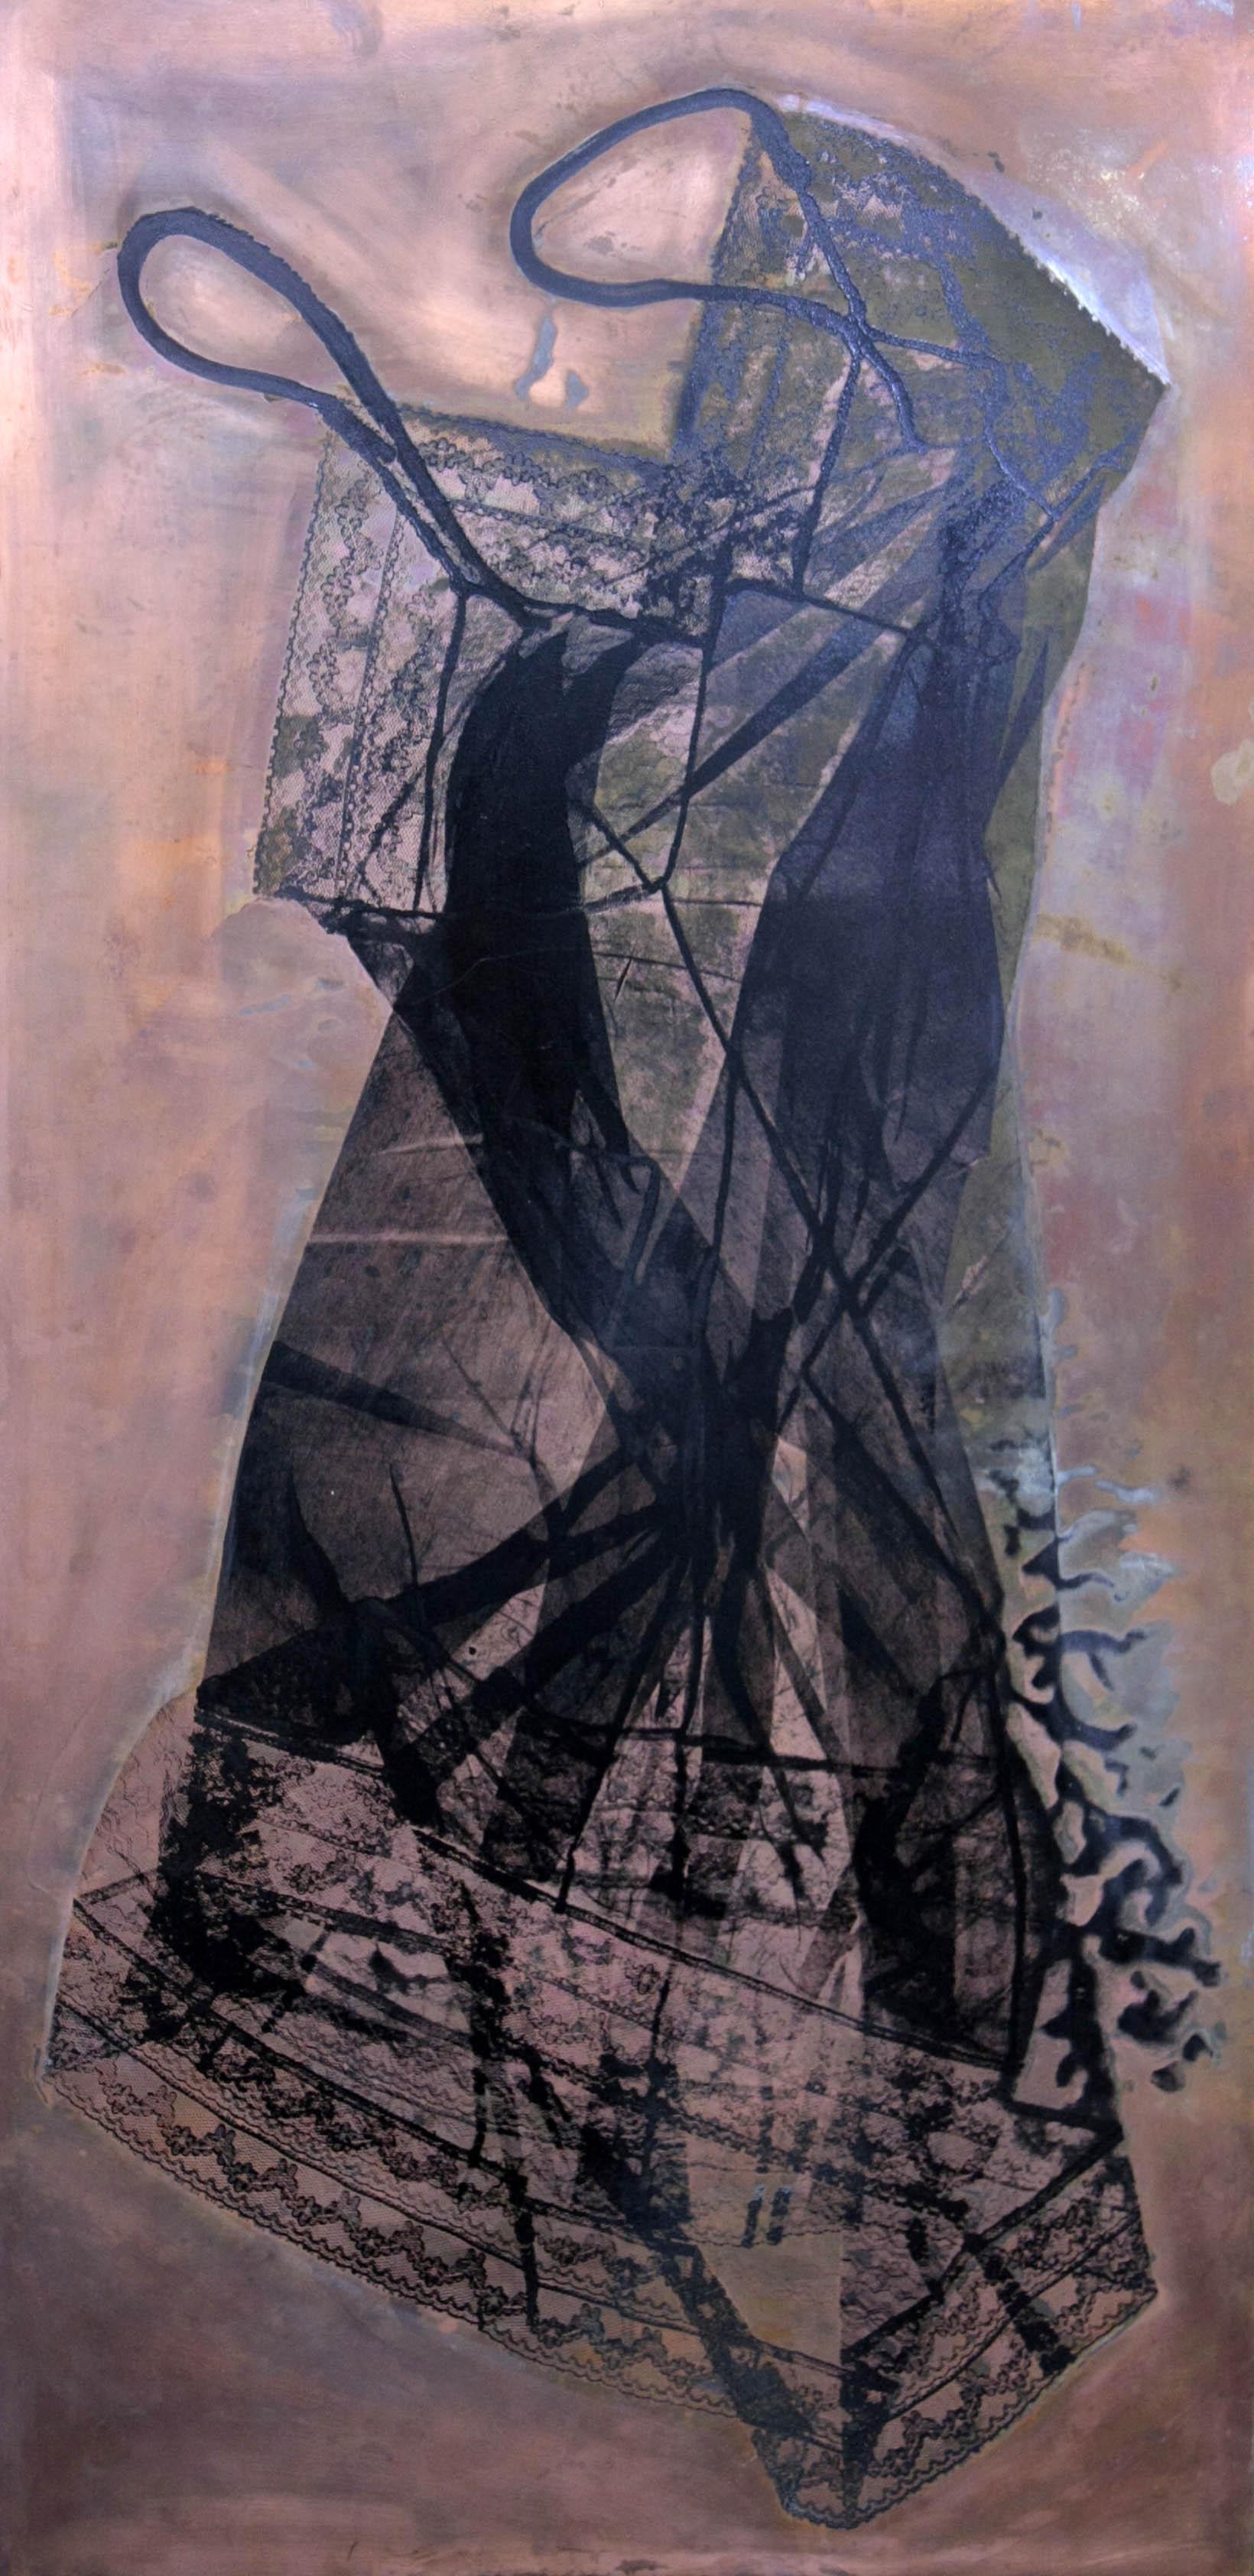 Vestale, tecnica mista su rame 100x50, 2010